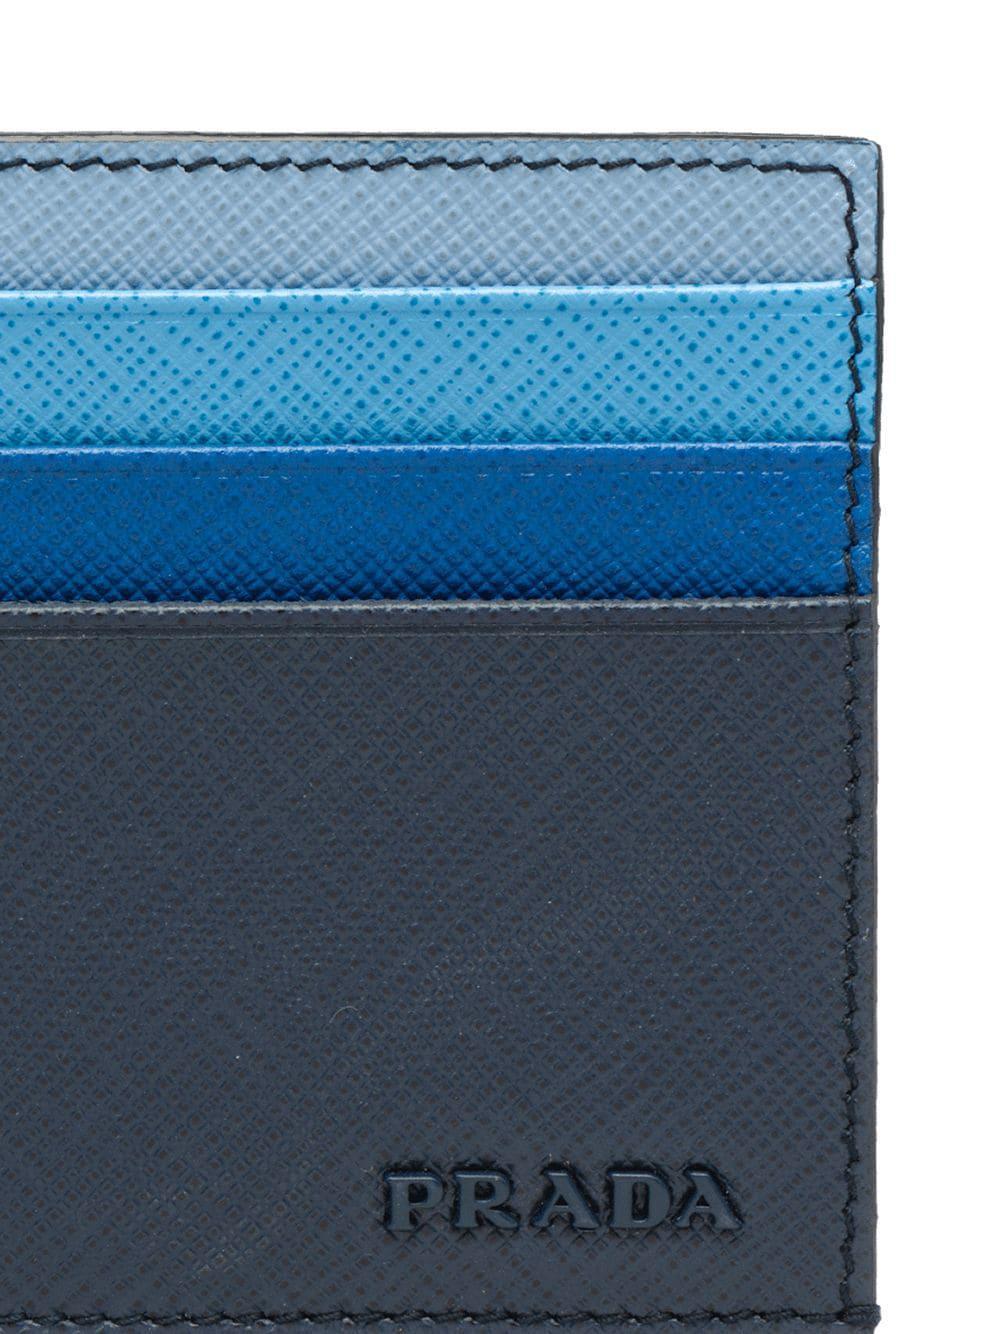 13261b58436de3 Prada - Blue Credit Card Holder for Men - Lyst. View fullscreen